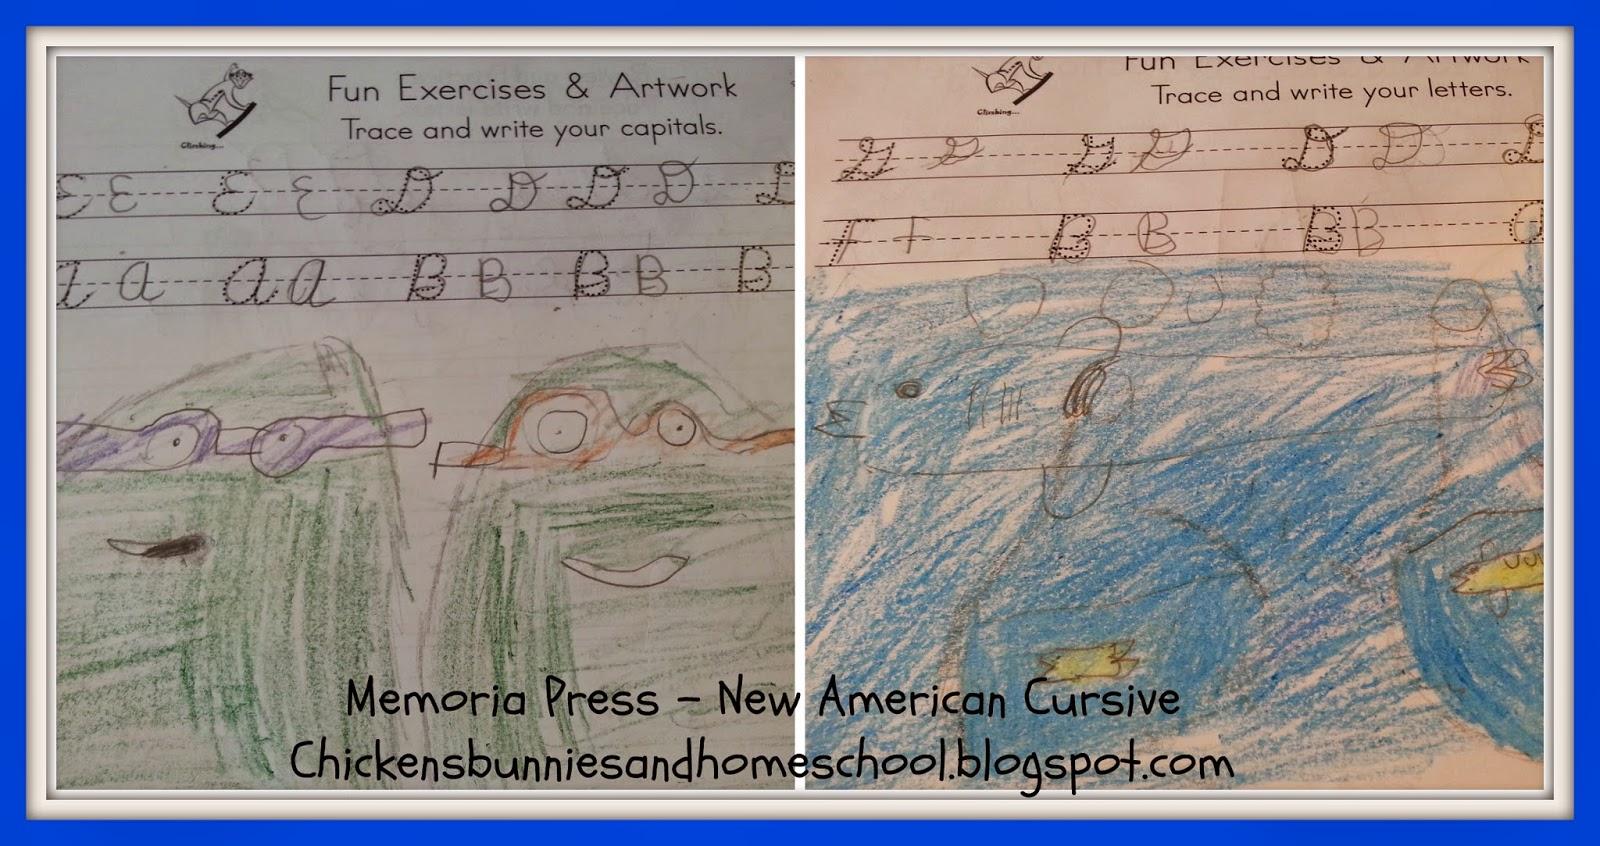 Chickensbunniesandhomeschool Memoria Press New American